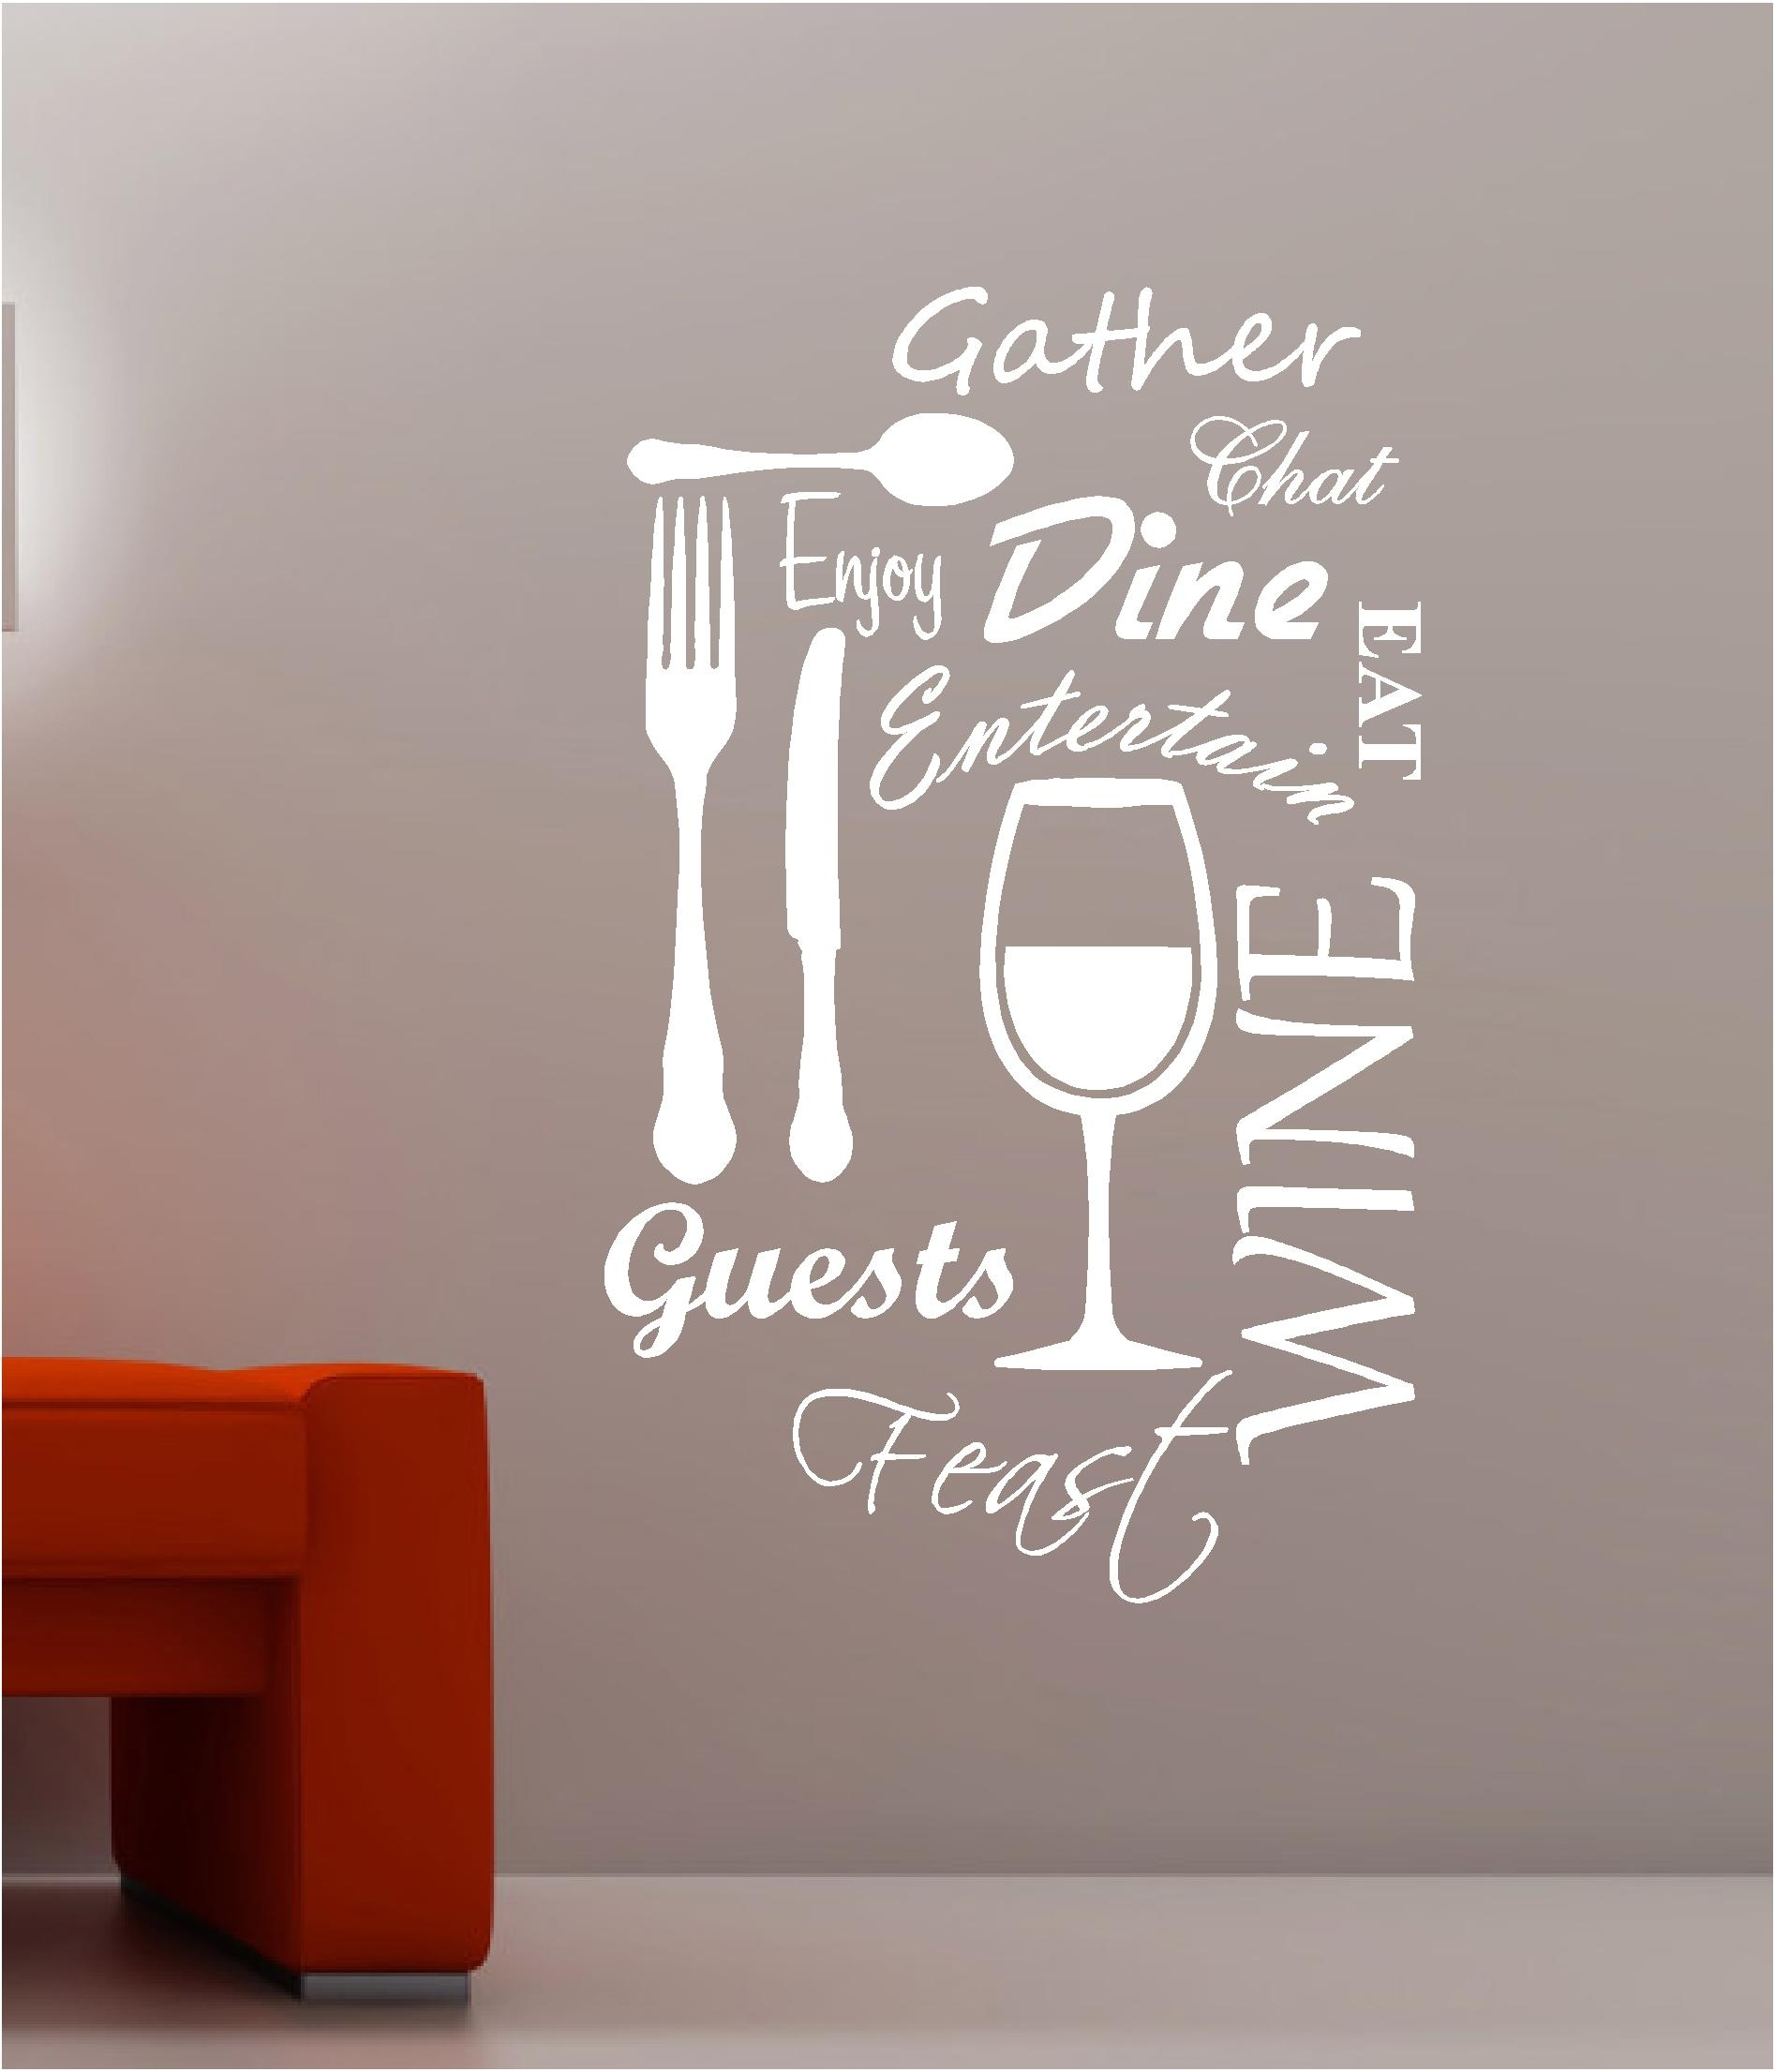 Kitchen Wall Art For A More Fresh Kitchen Decor » Inoutinterior With Regard To Kitchen Wall Art (Image 11 of 20)